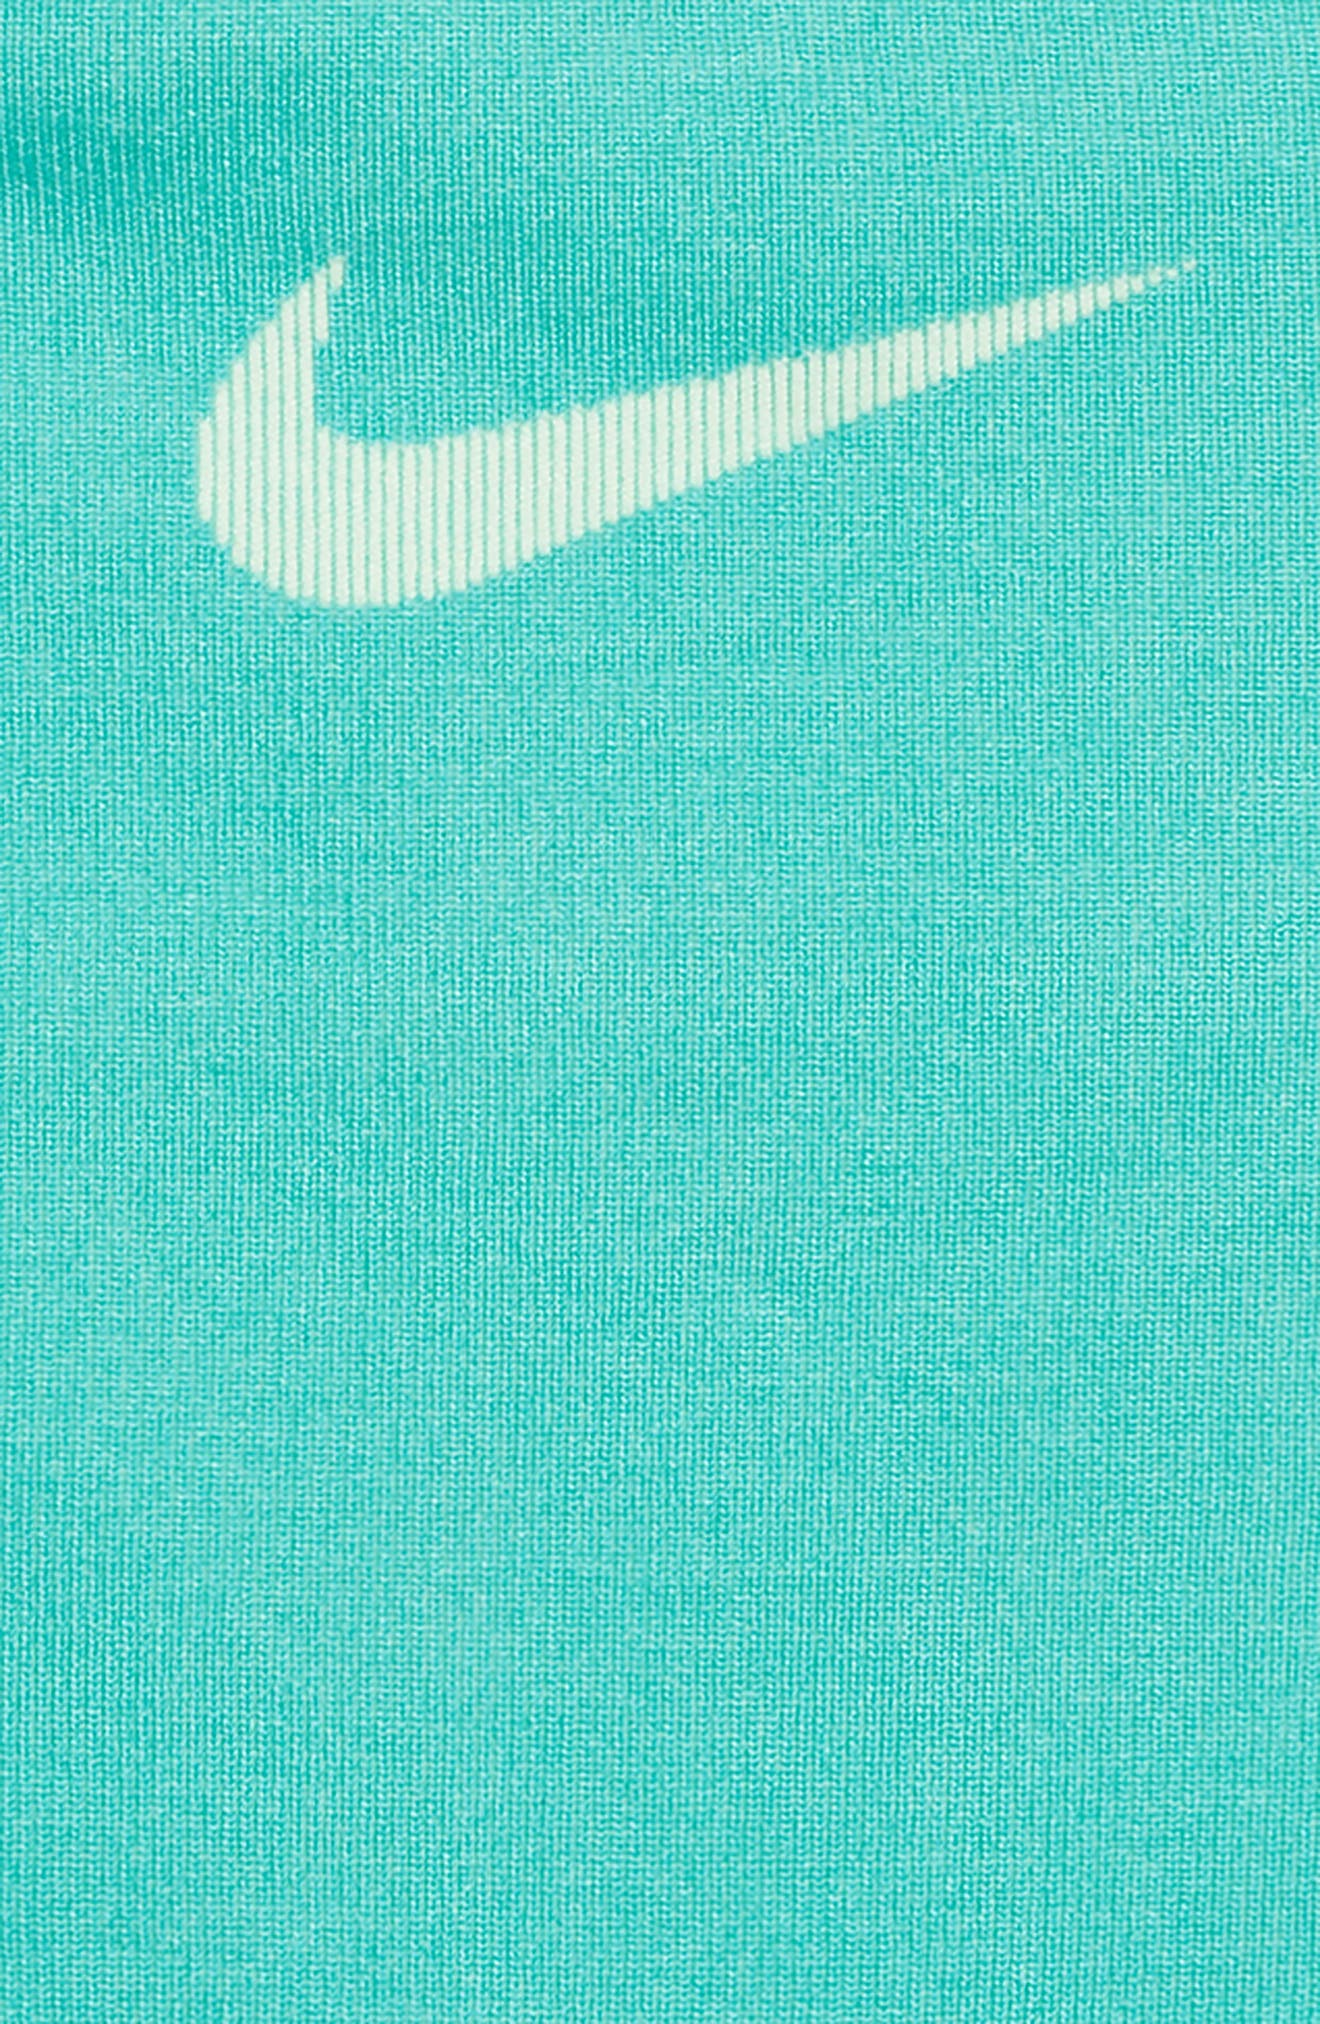 NIKE,                             Seamless Sports Bra,                             Alternate thumbnail 3, color,                             317